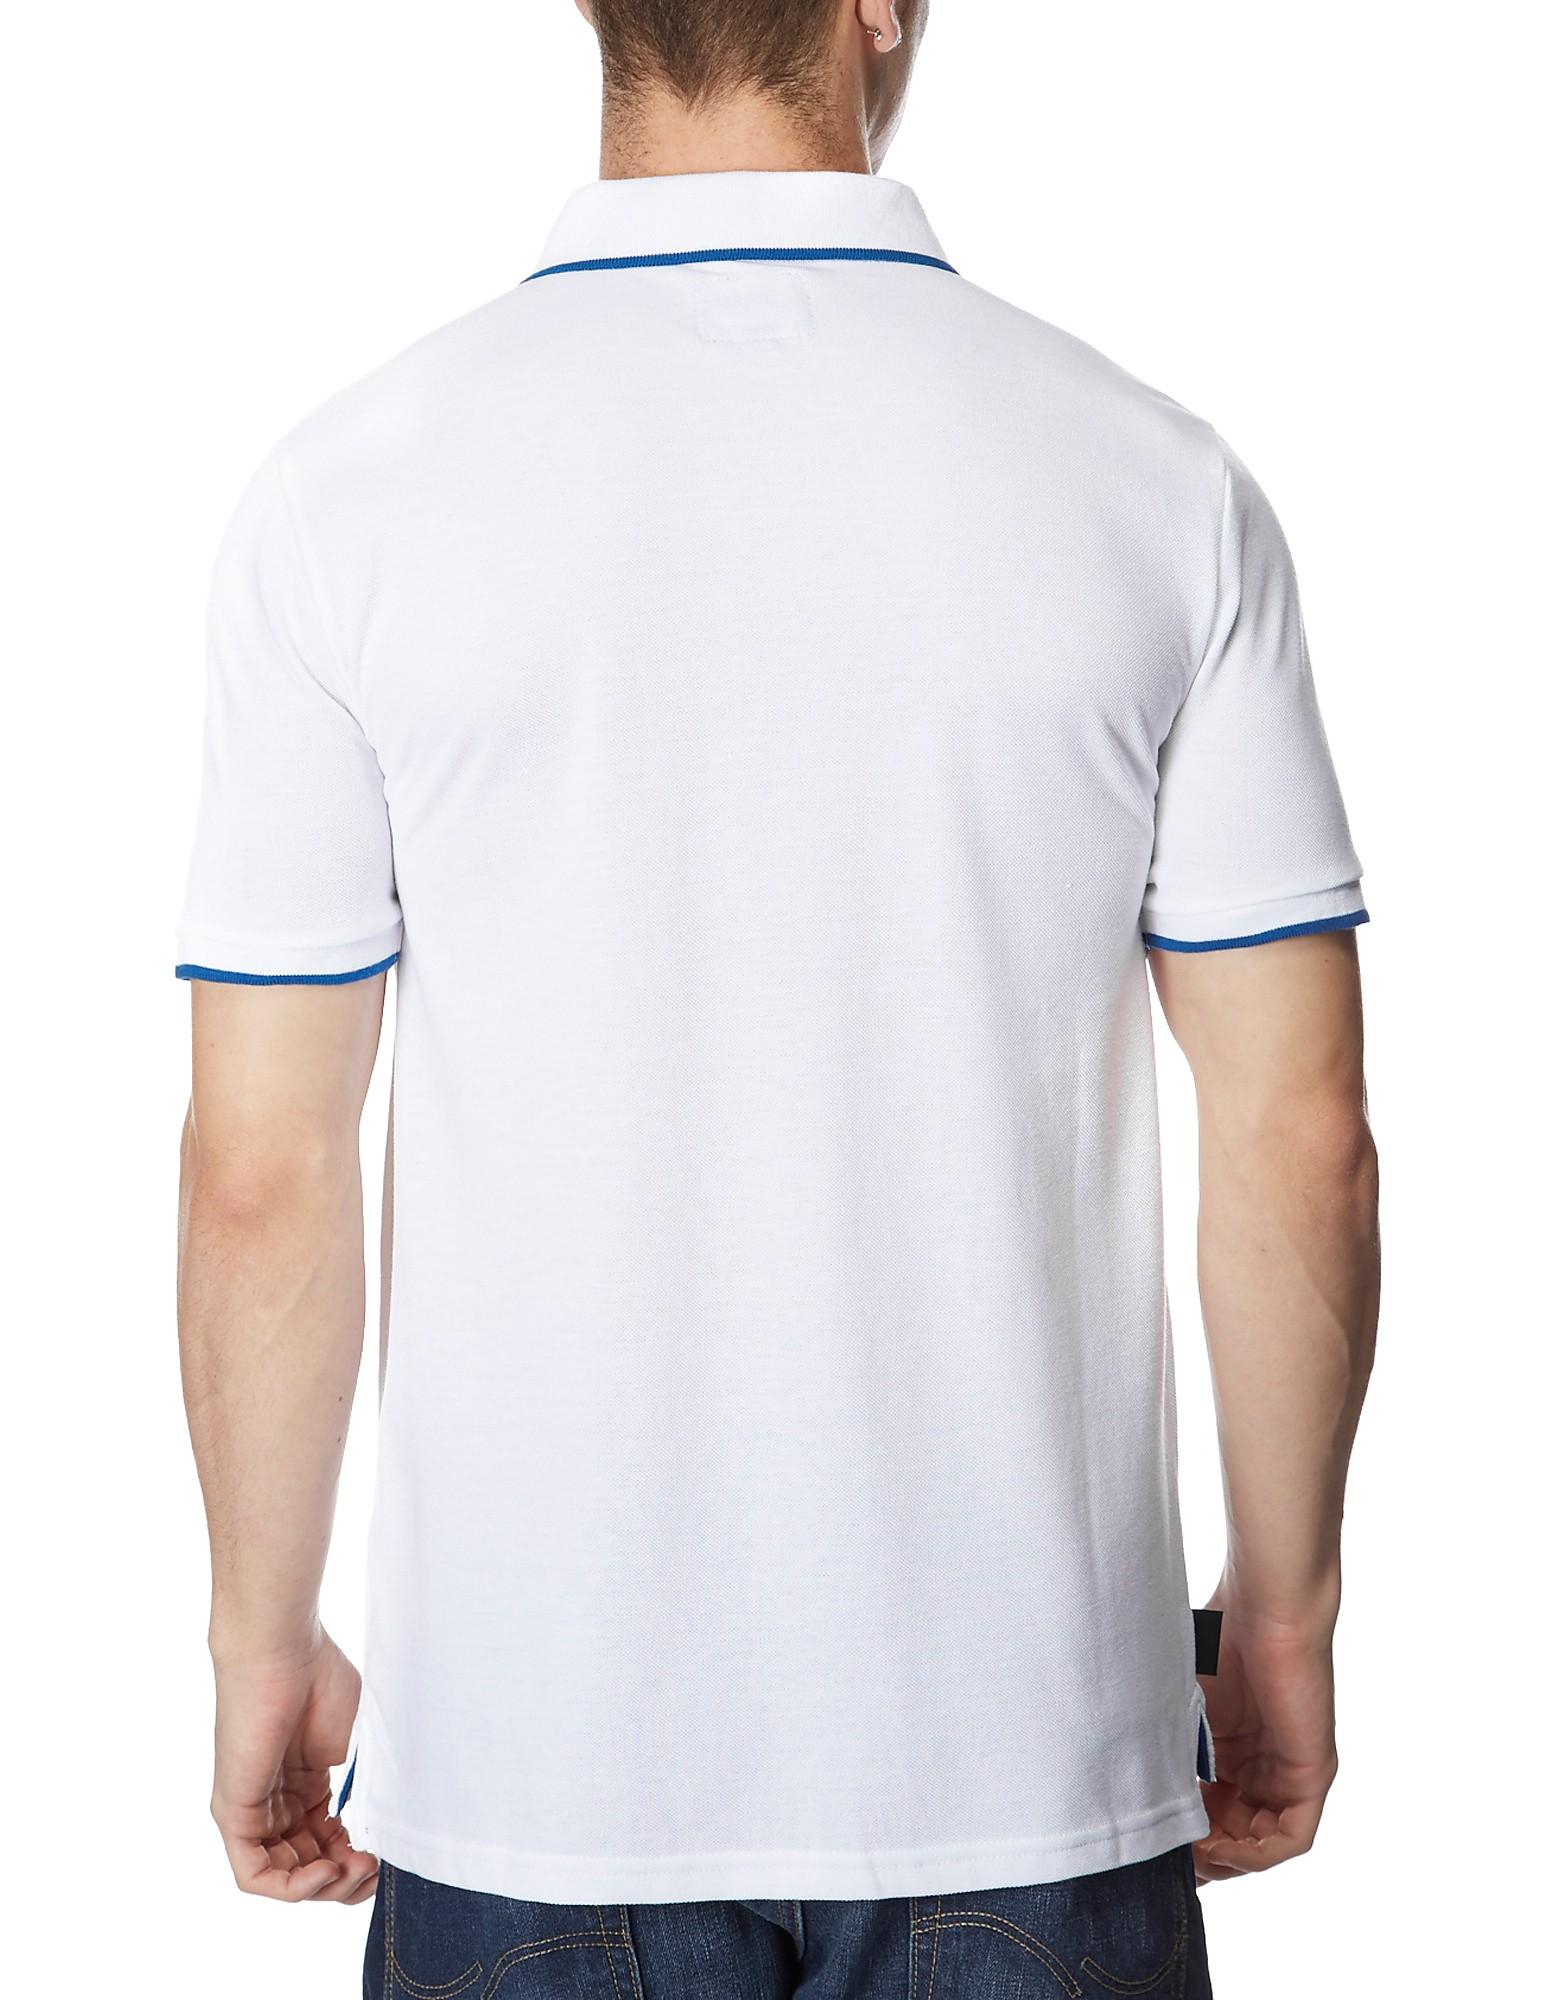 Henleys Ralster Polo Shirt